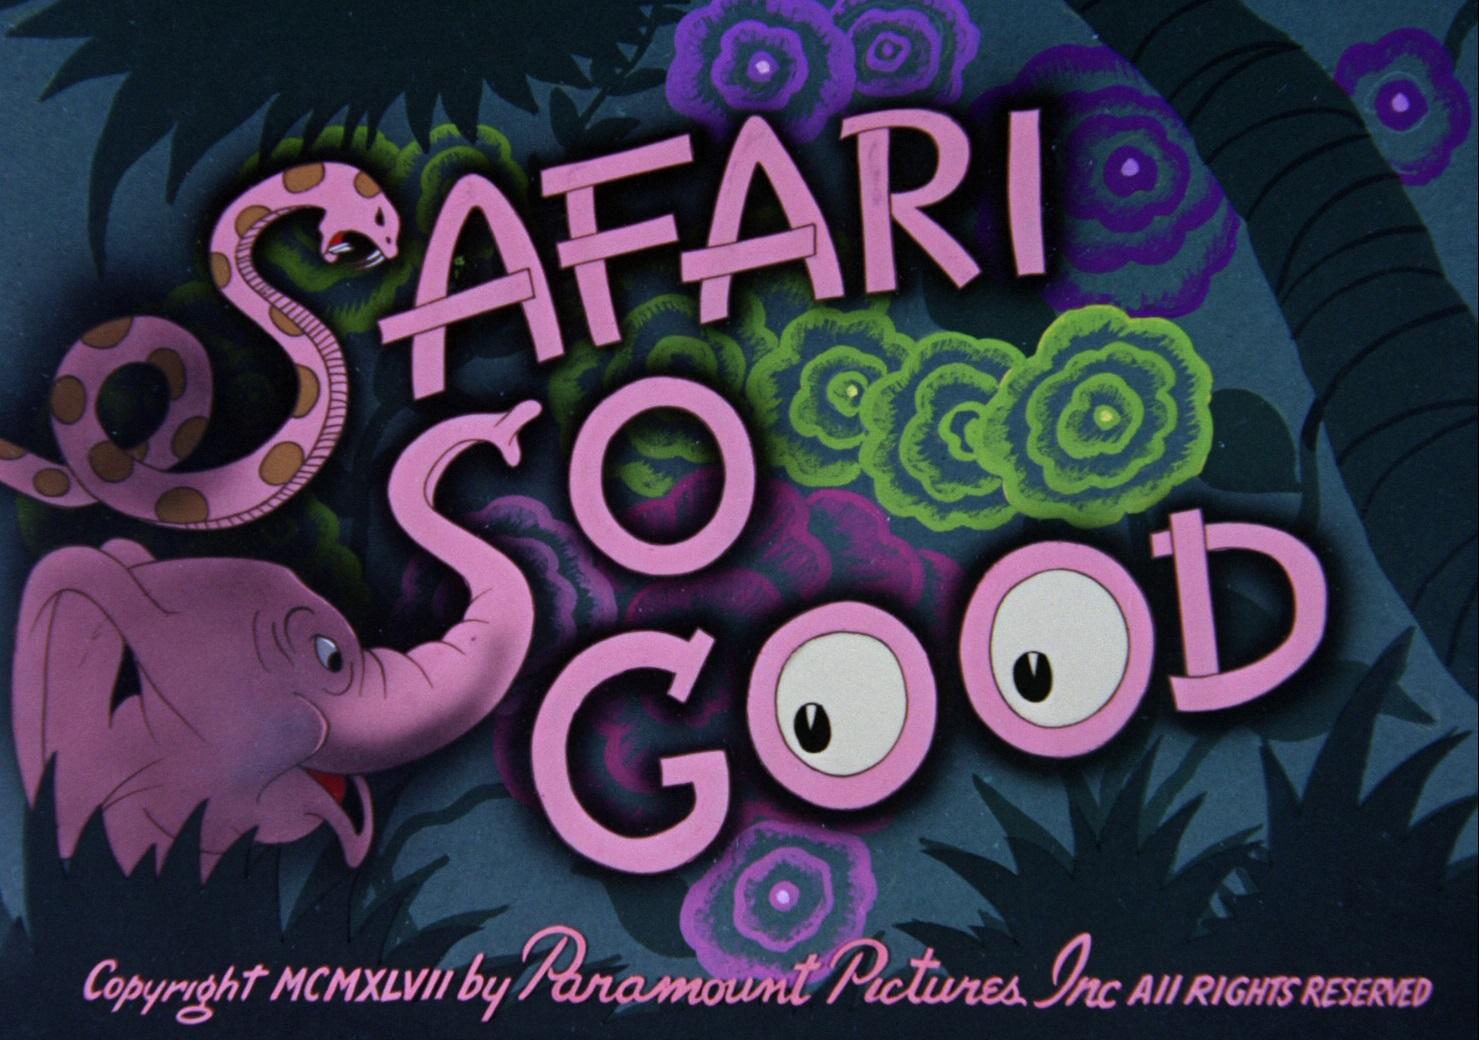 SafariSoGood